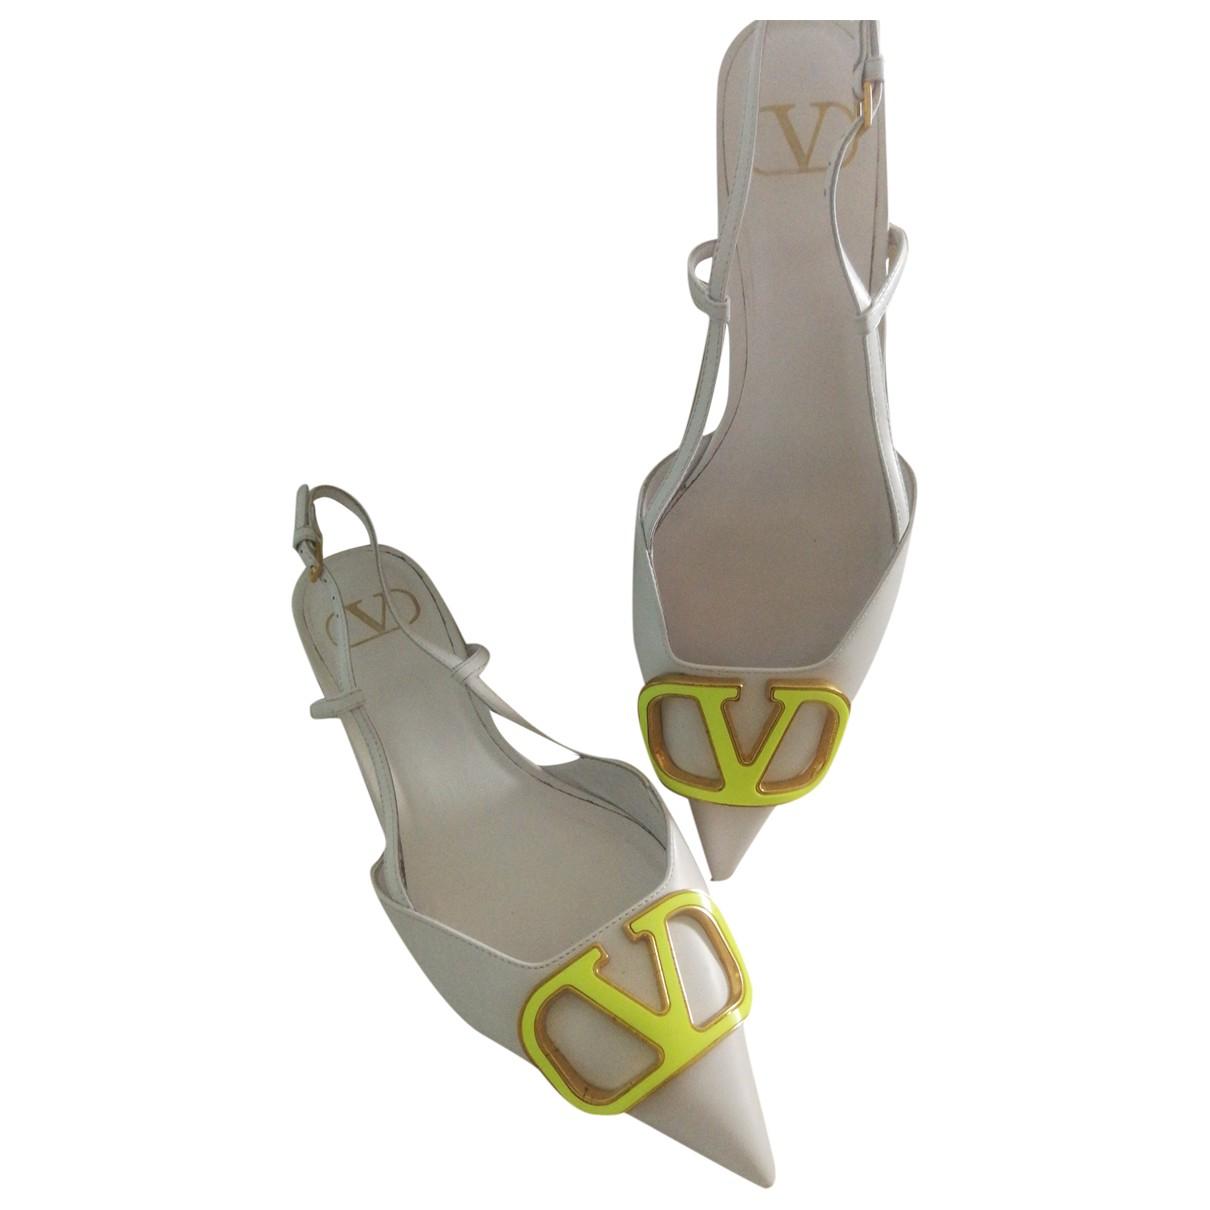 Valentino Garavani - Escarpins VLOGO pour femme en cuir - blanc